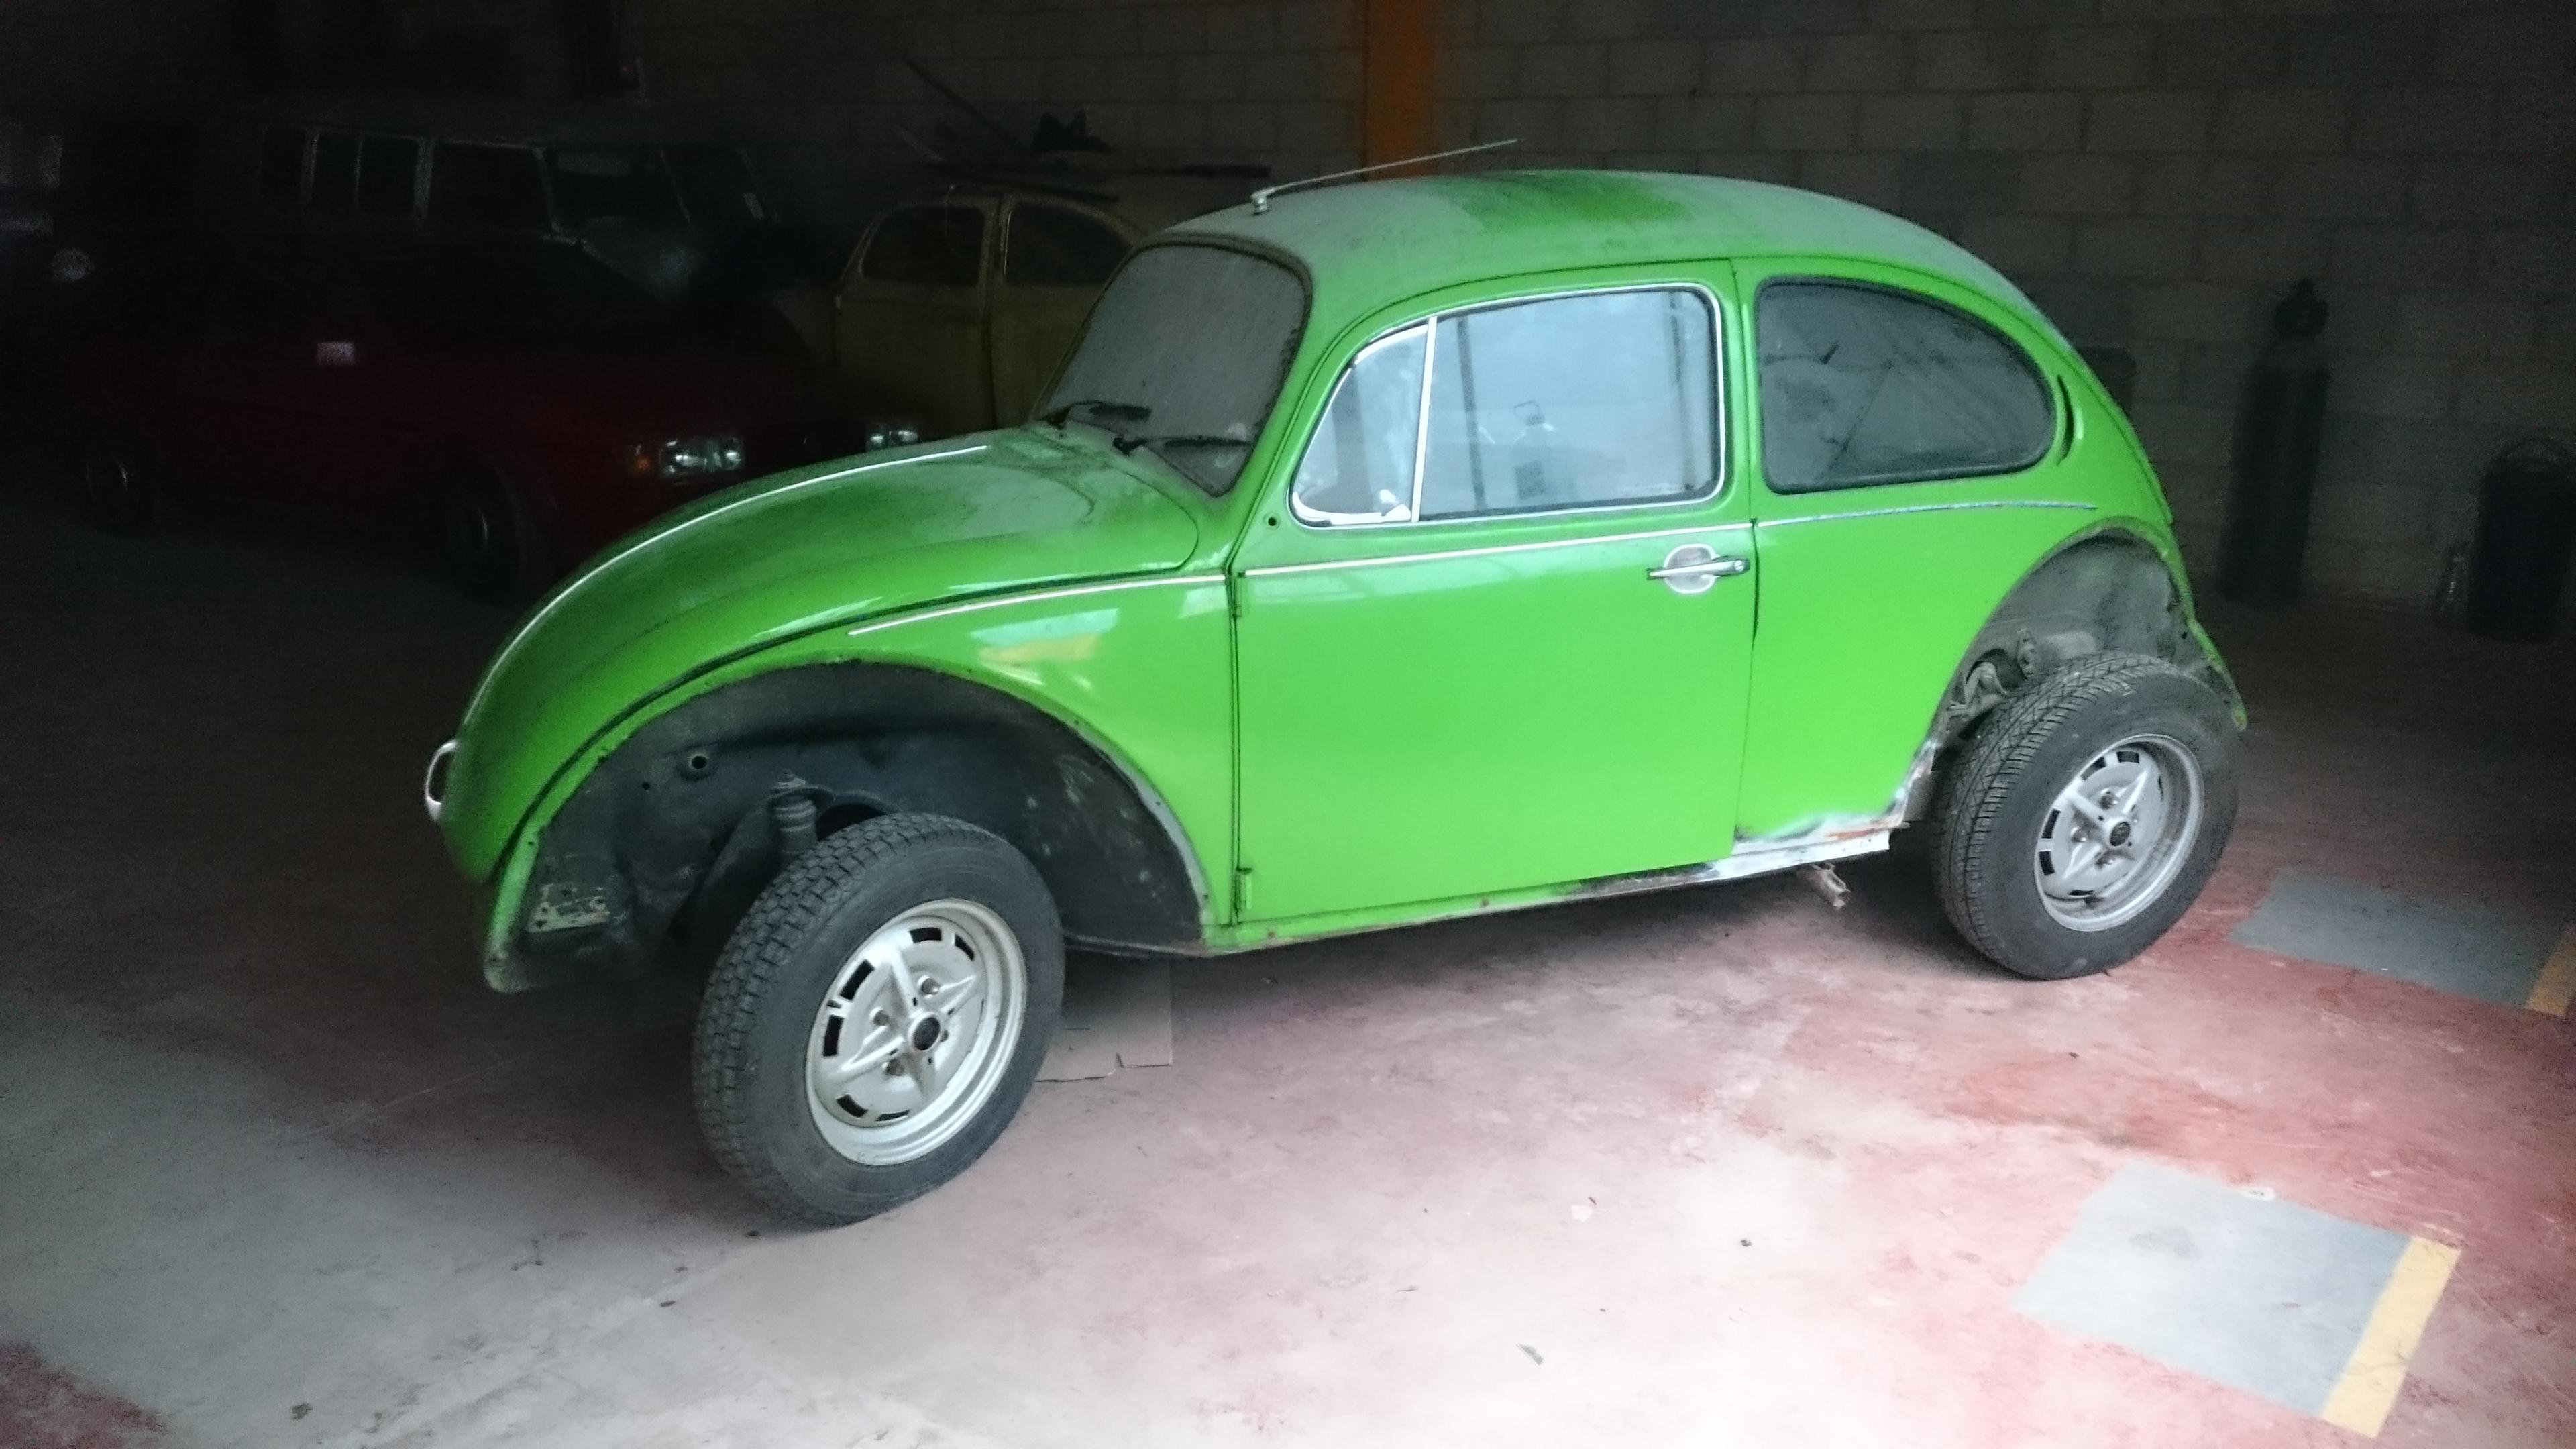 Apple green GT Beetle restoration